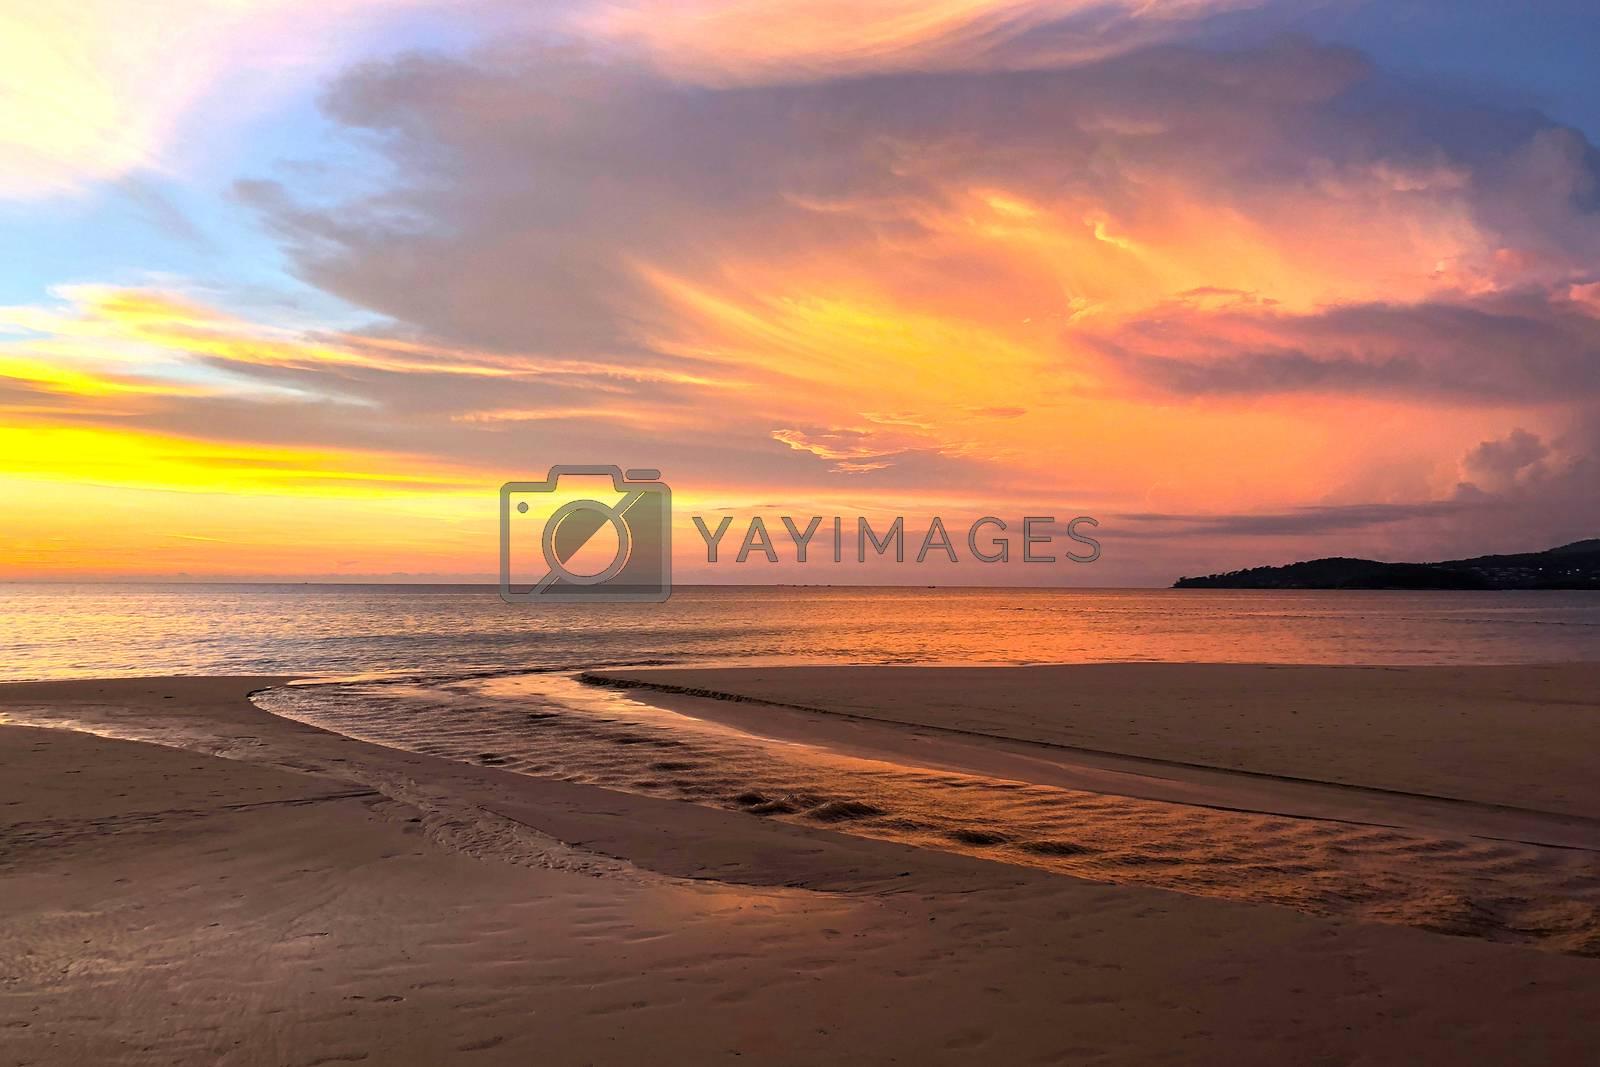 View of sunset at Karon beach in Phuket, Thailand